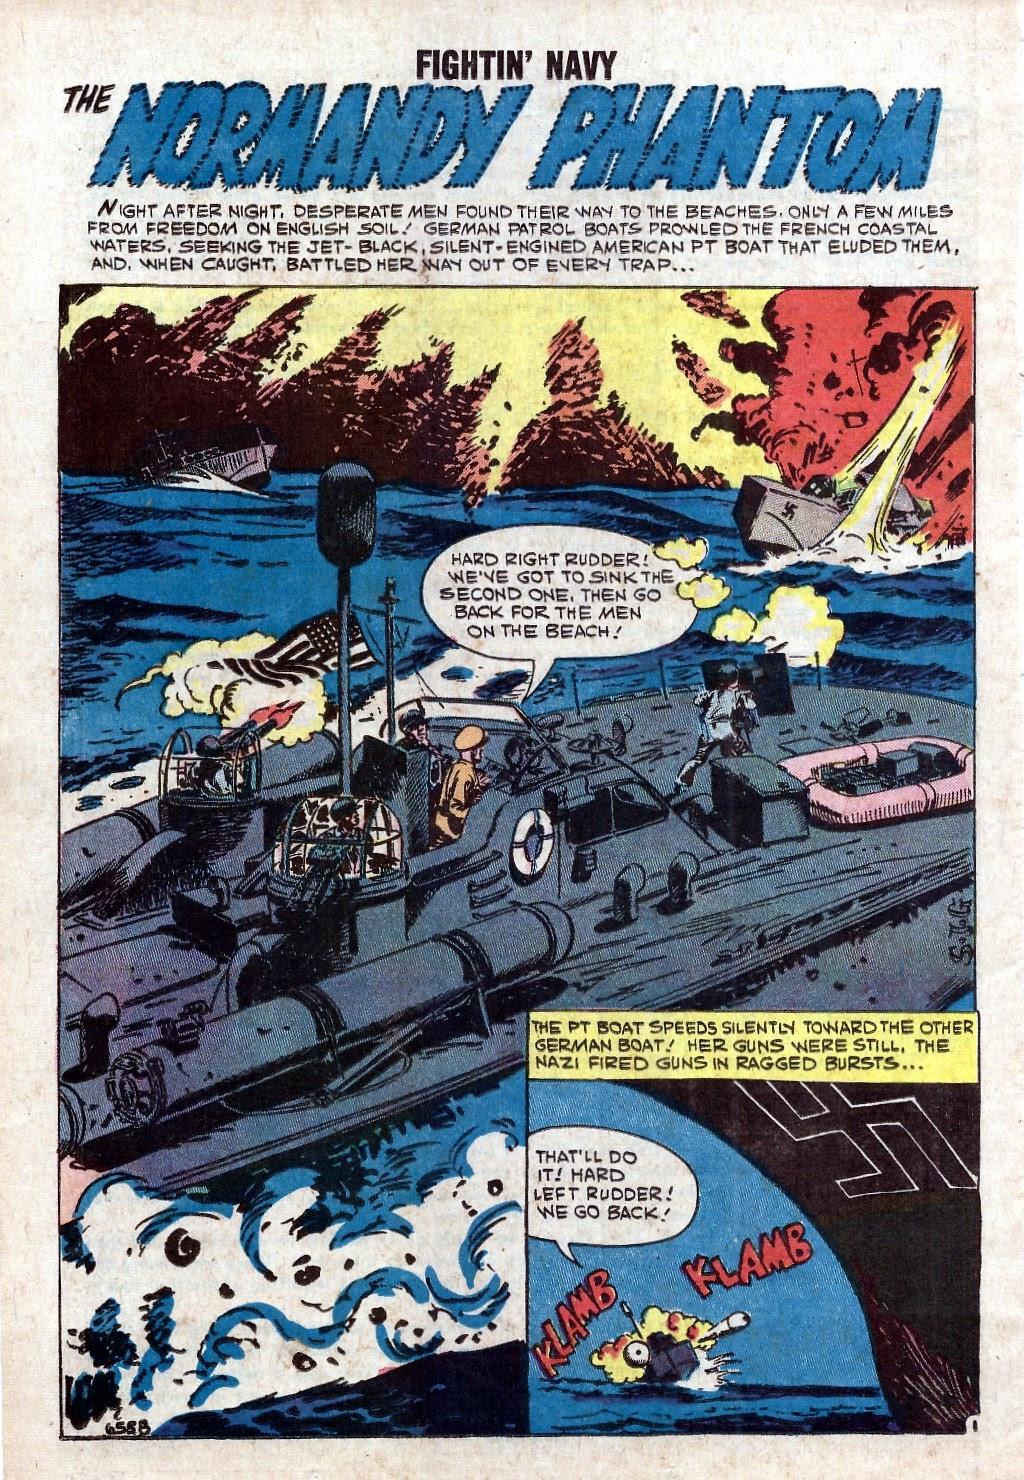 Read online Fightin' Navy comic -  Issue #94 - 26